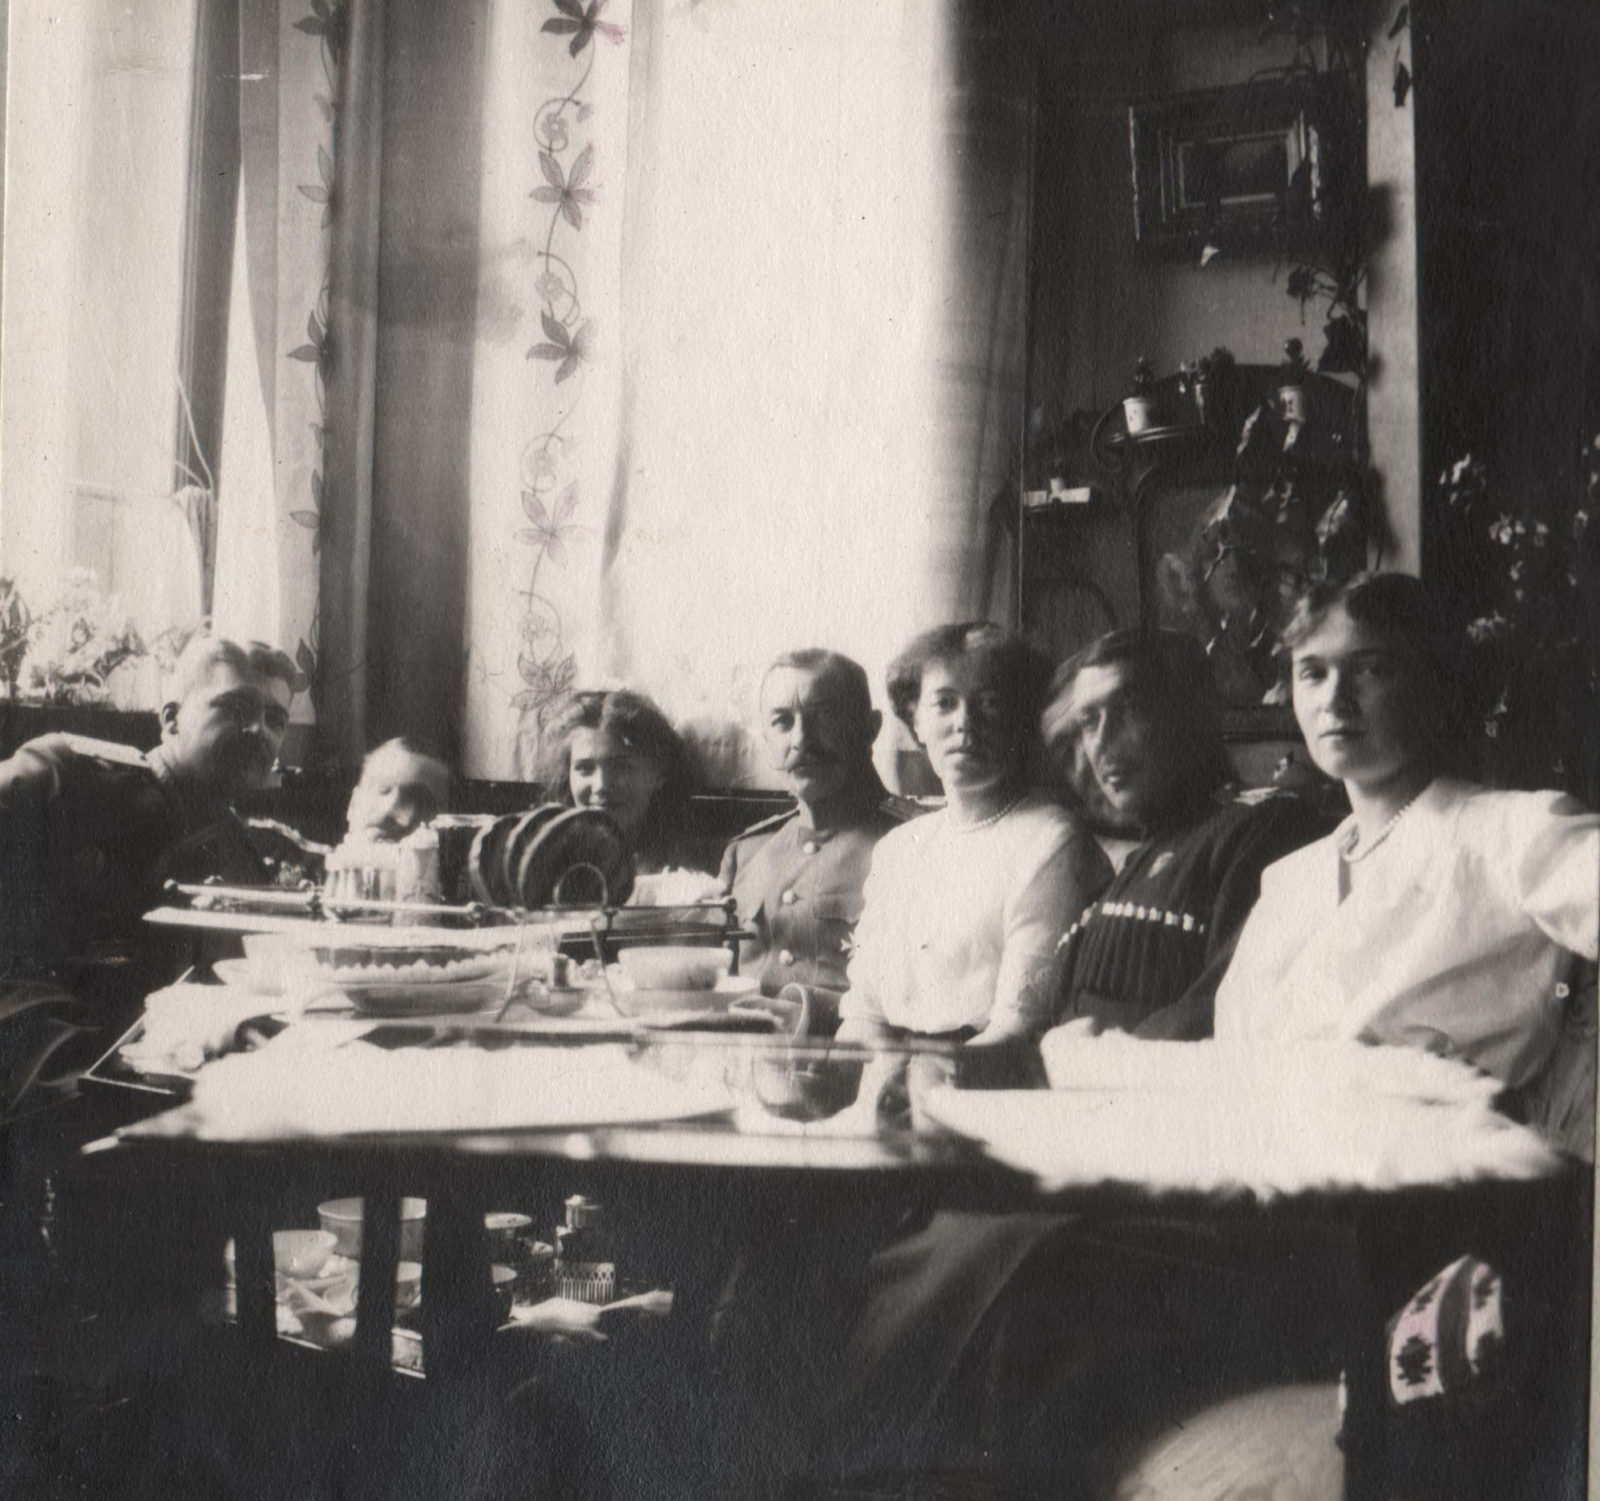 Daughters of Emperor Nicholas II Grand Princess Olga, Maria Nikolaevna and Grand Duchess Olga Alexandrovna with relatives.